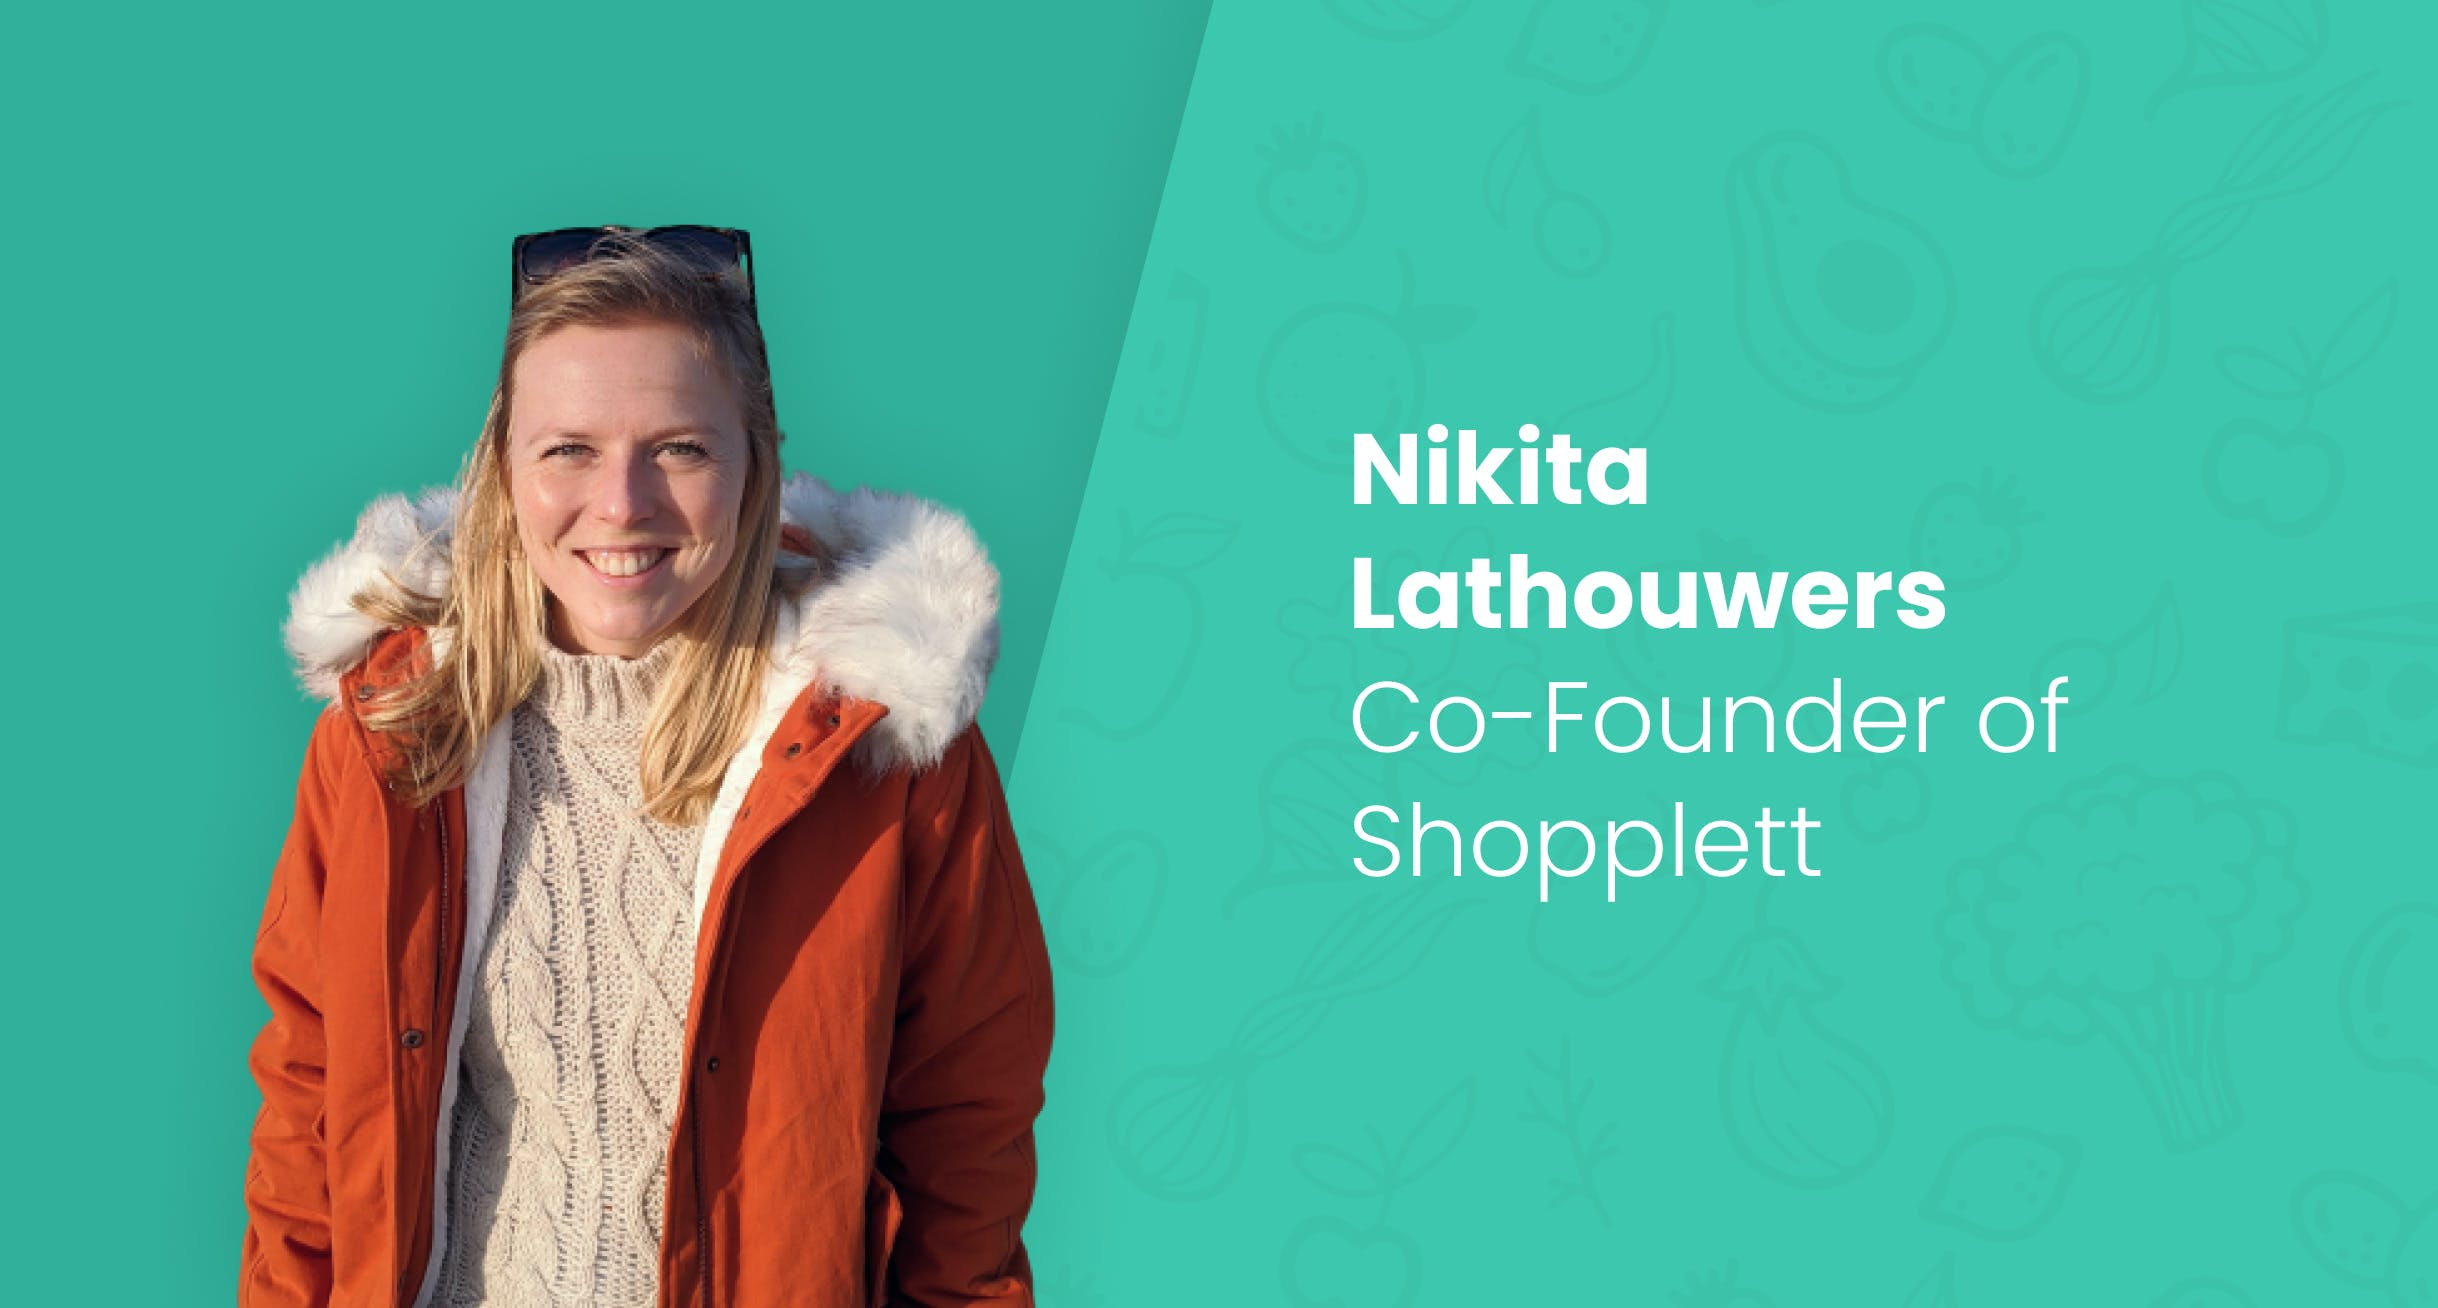 Shopplett - Interview with Nikita Lathouwers, Co-Founder